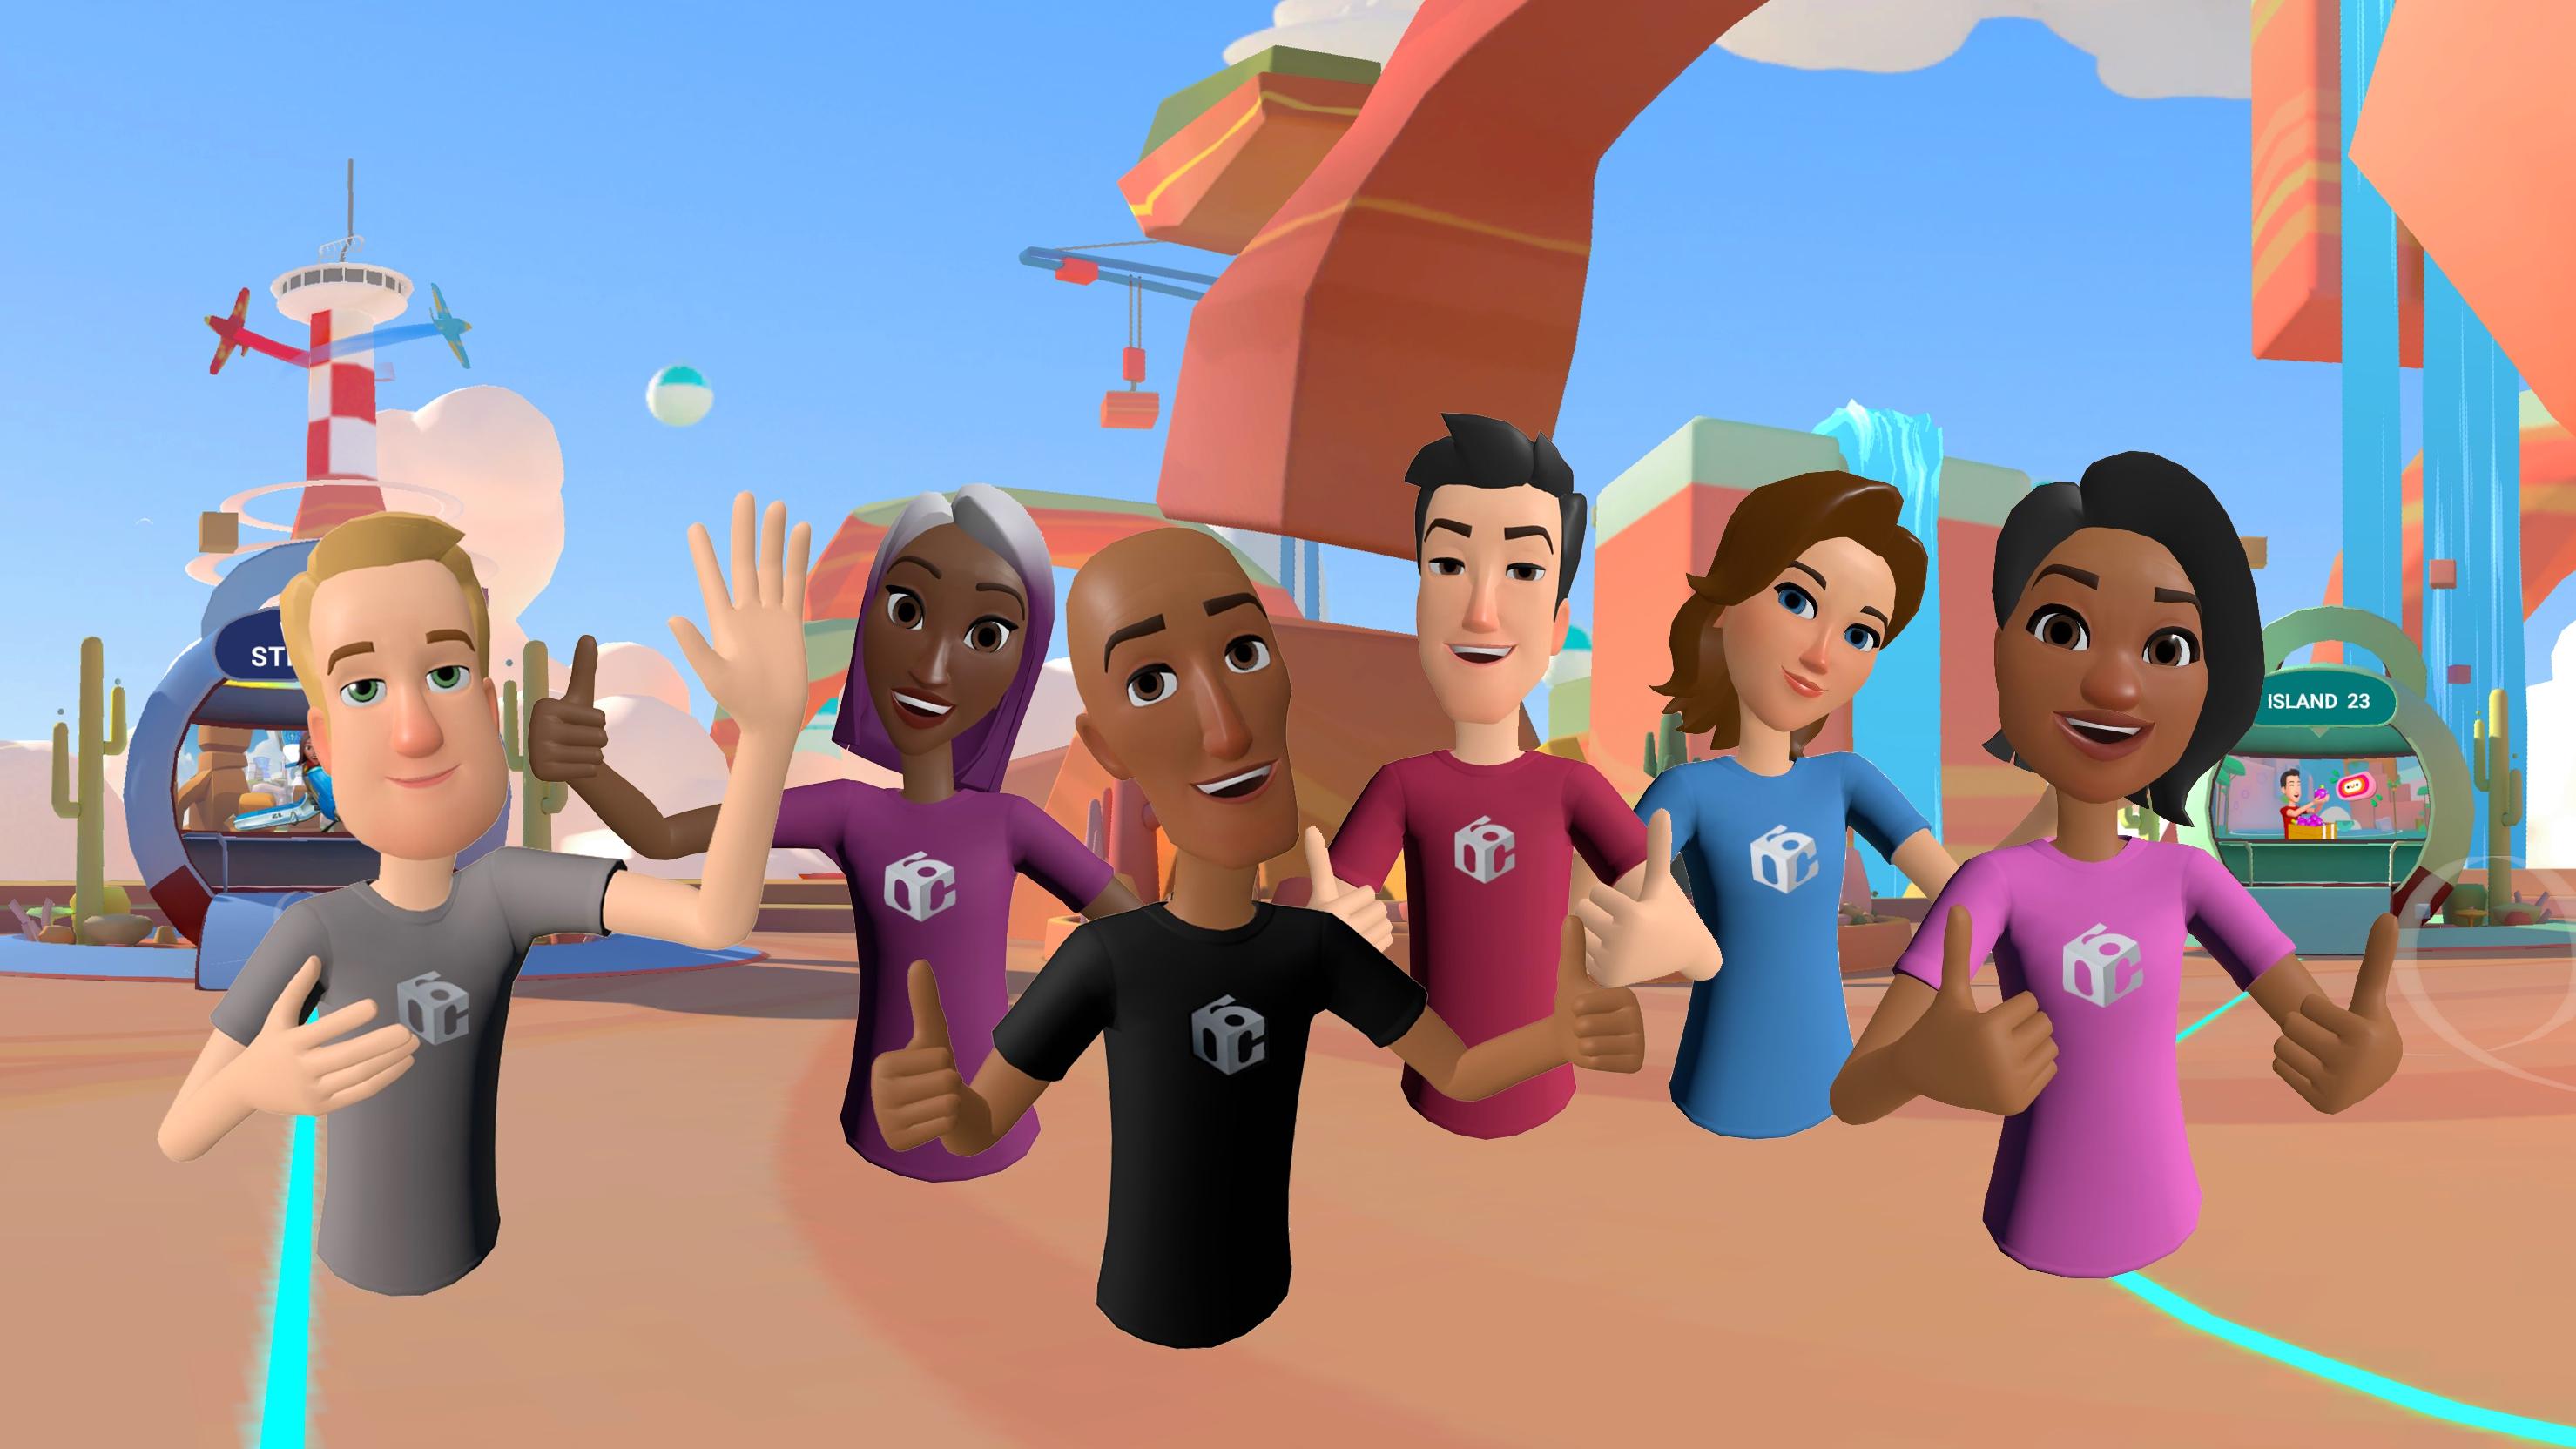 Facebook diventa virtuale grazie a Oculus e Horizon